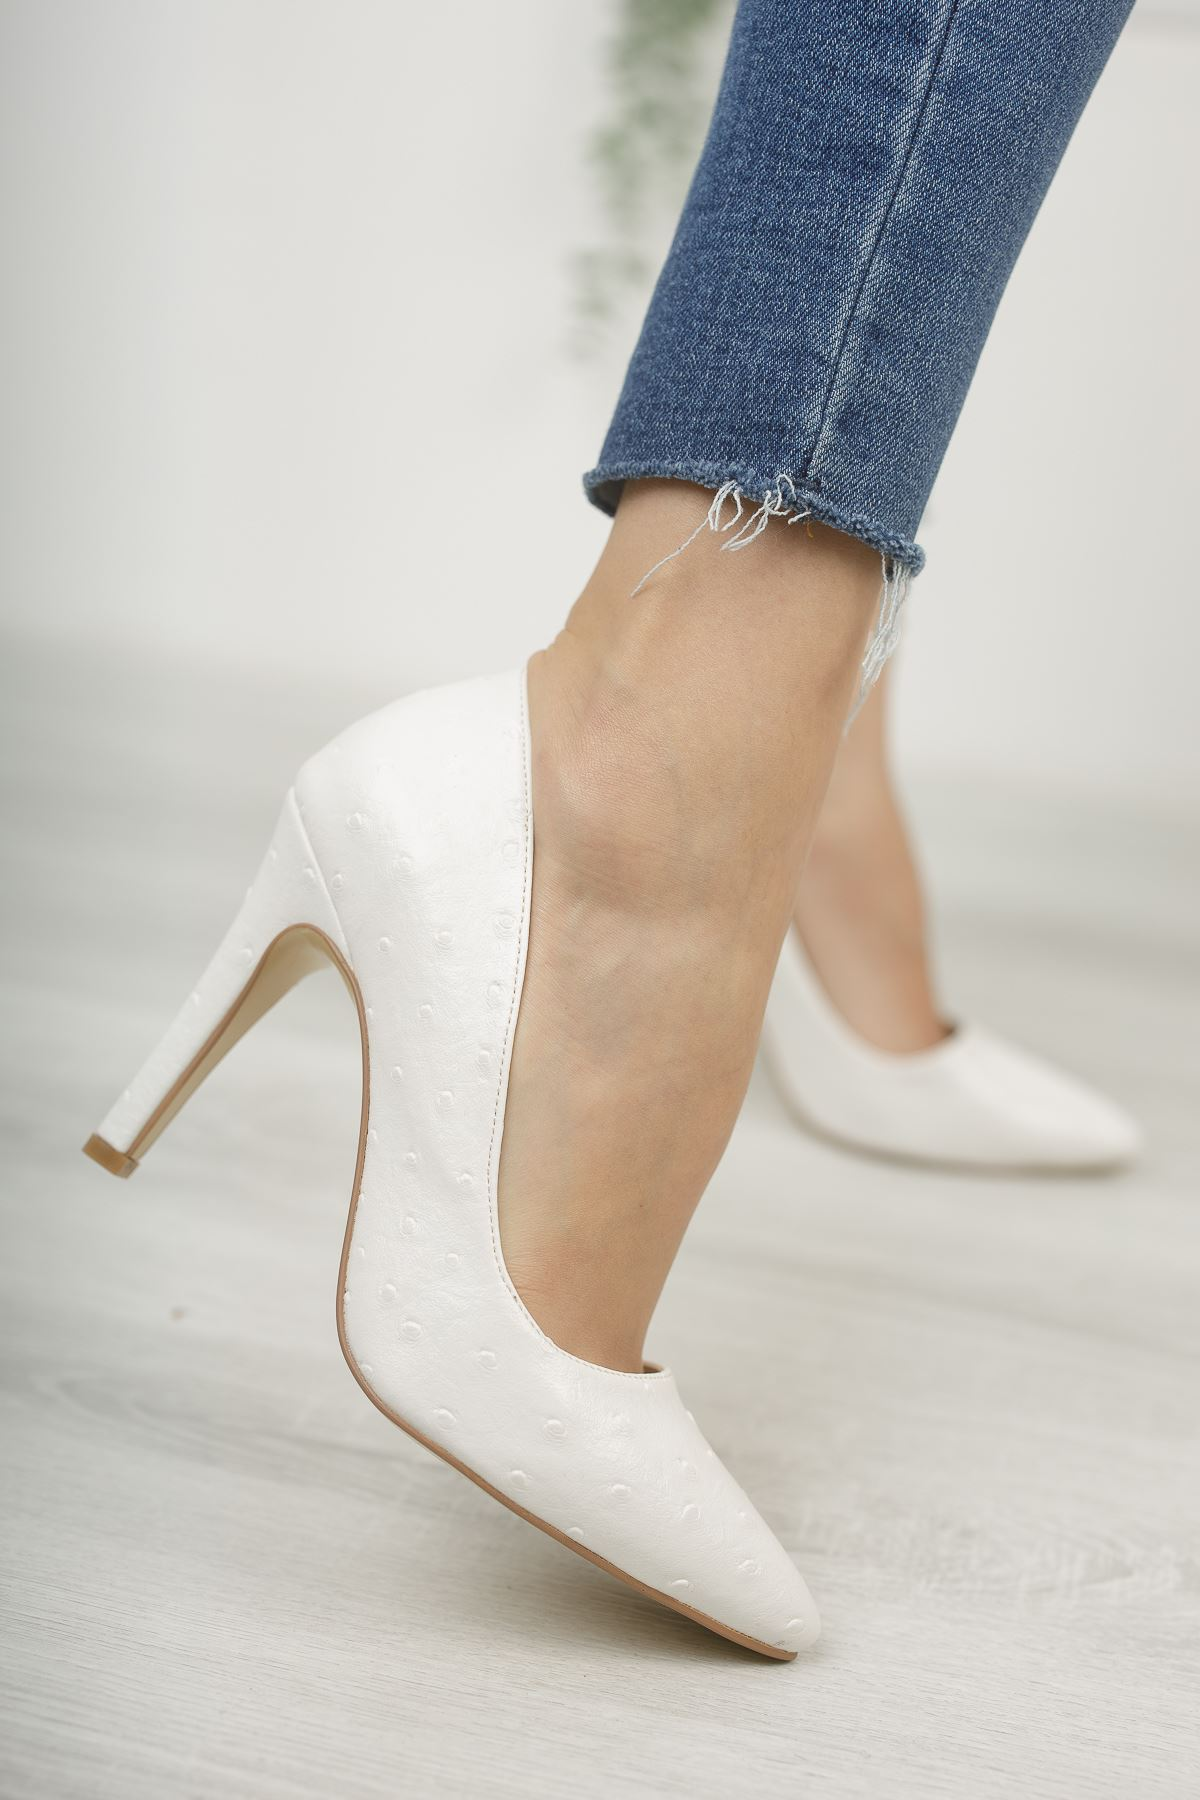 Mariam Beyaz Yüksek Topuklu Stiletto